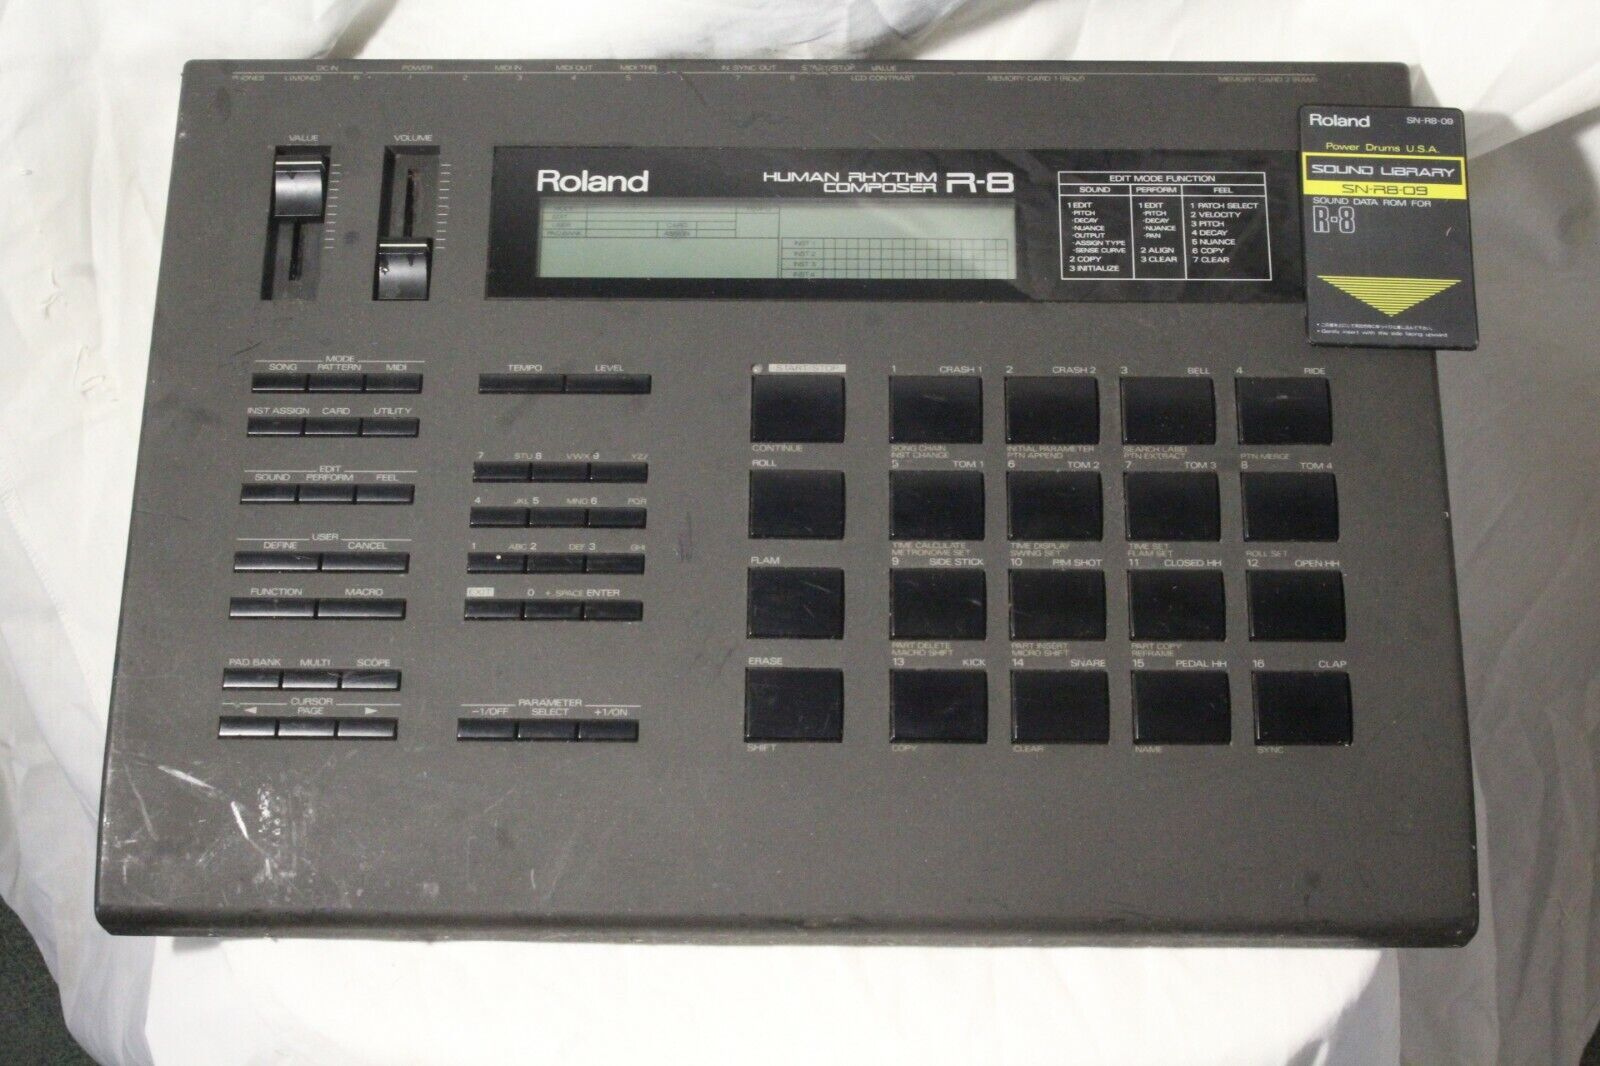 Roland R 8 & SN-R8-09 Power Drums USA